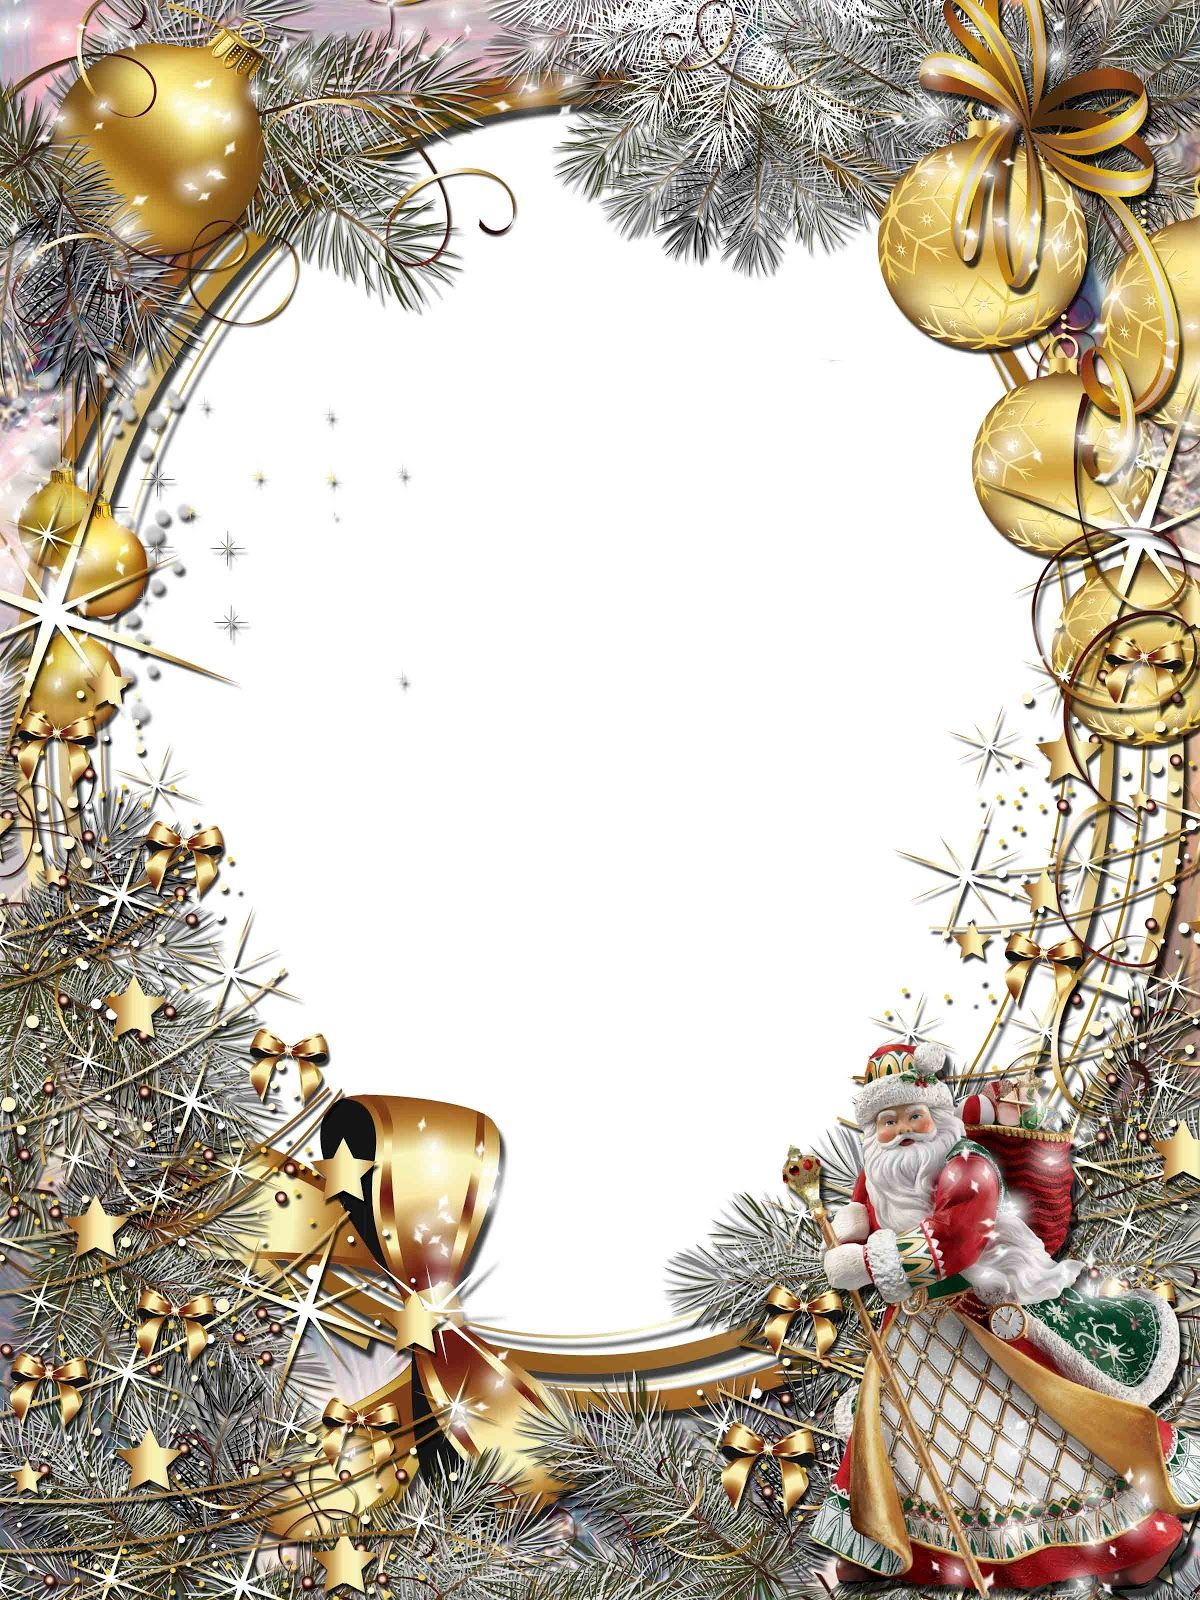 Pin by Ken Mastin on Christmas Frames & Wallpaper | Christmas ...